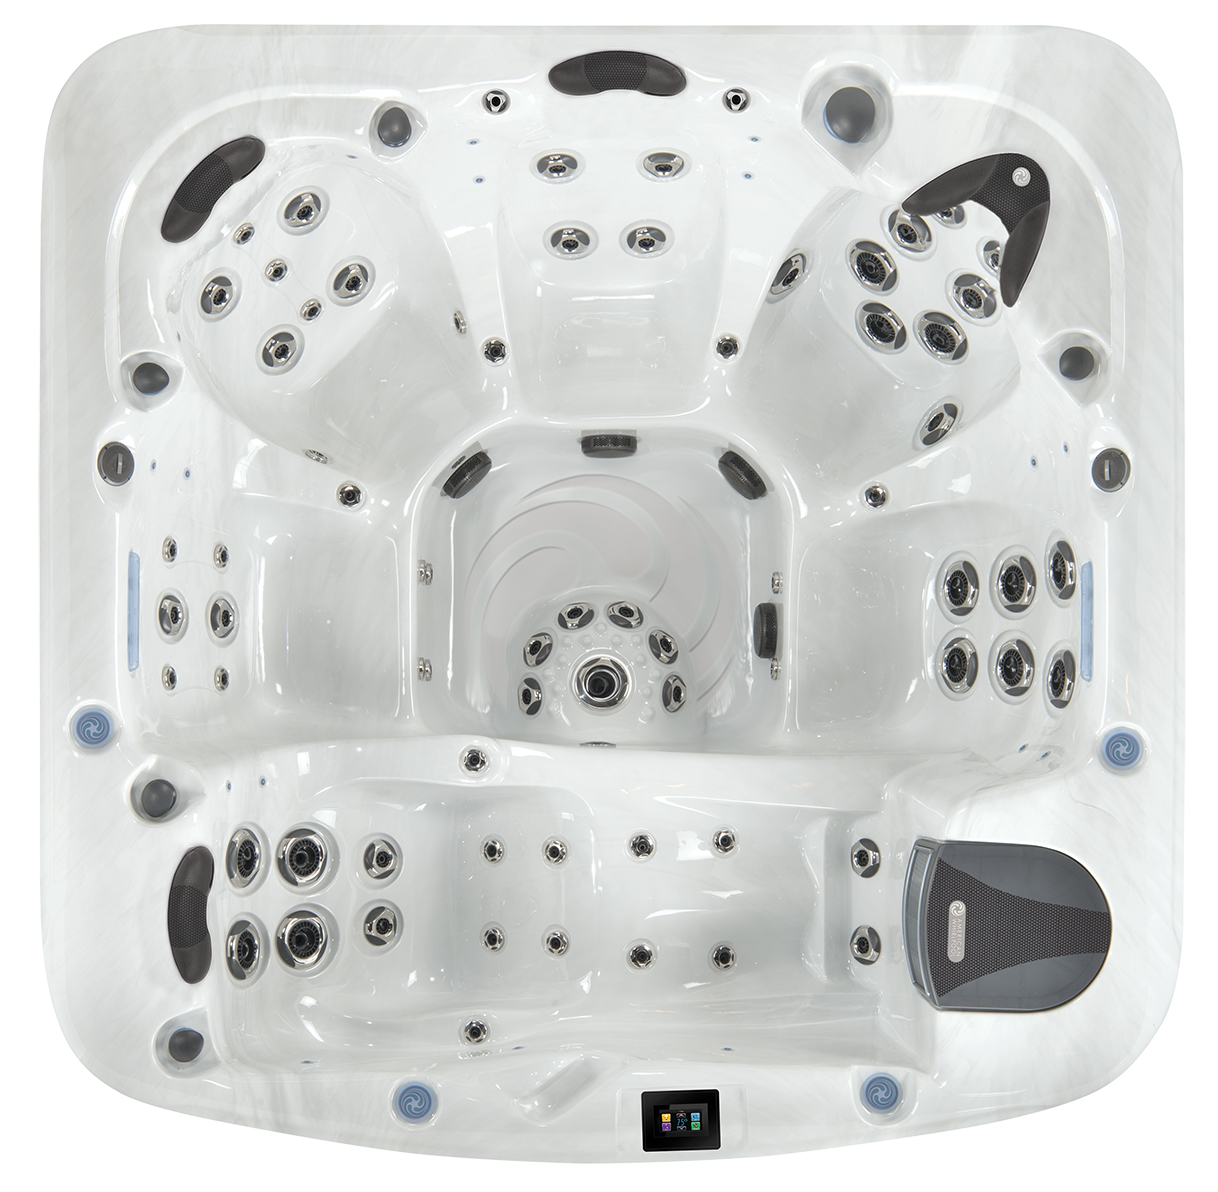 AW 881 Hot Tub